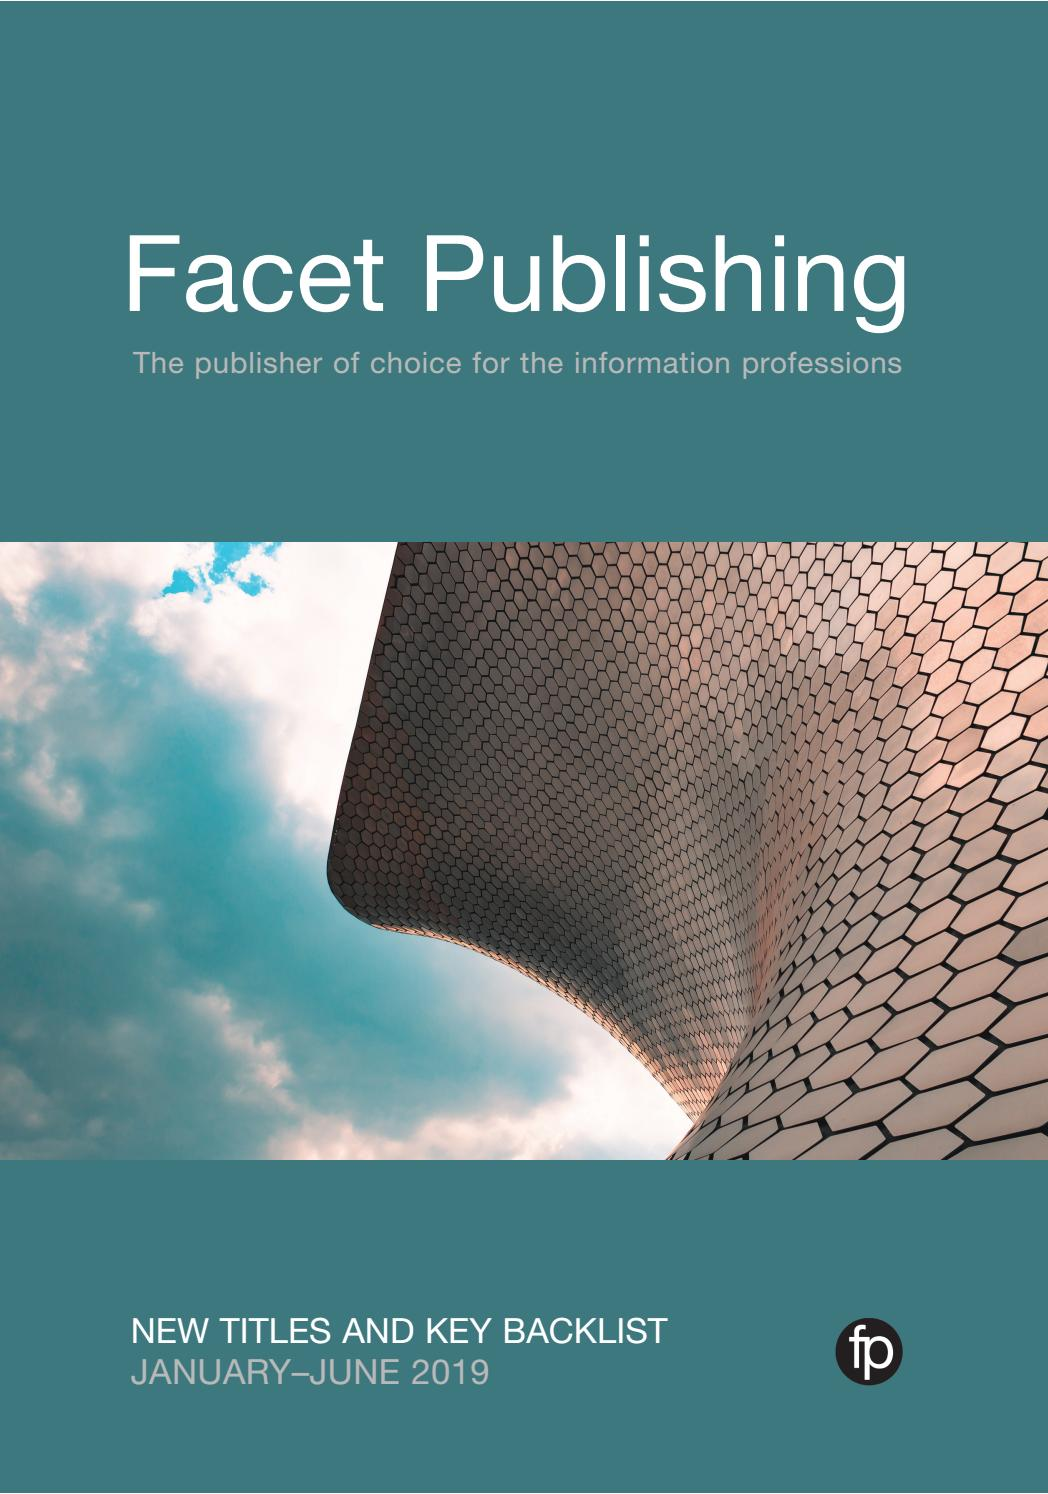 Facet Publishing Catalogue January-June 2019 by Facet